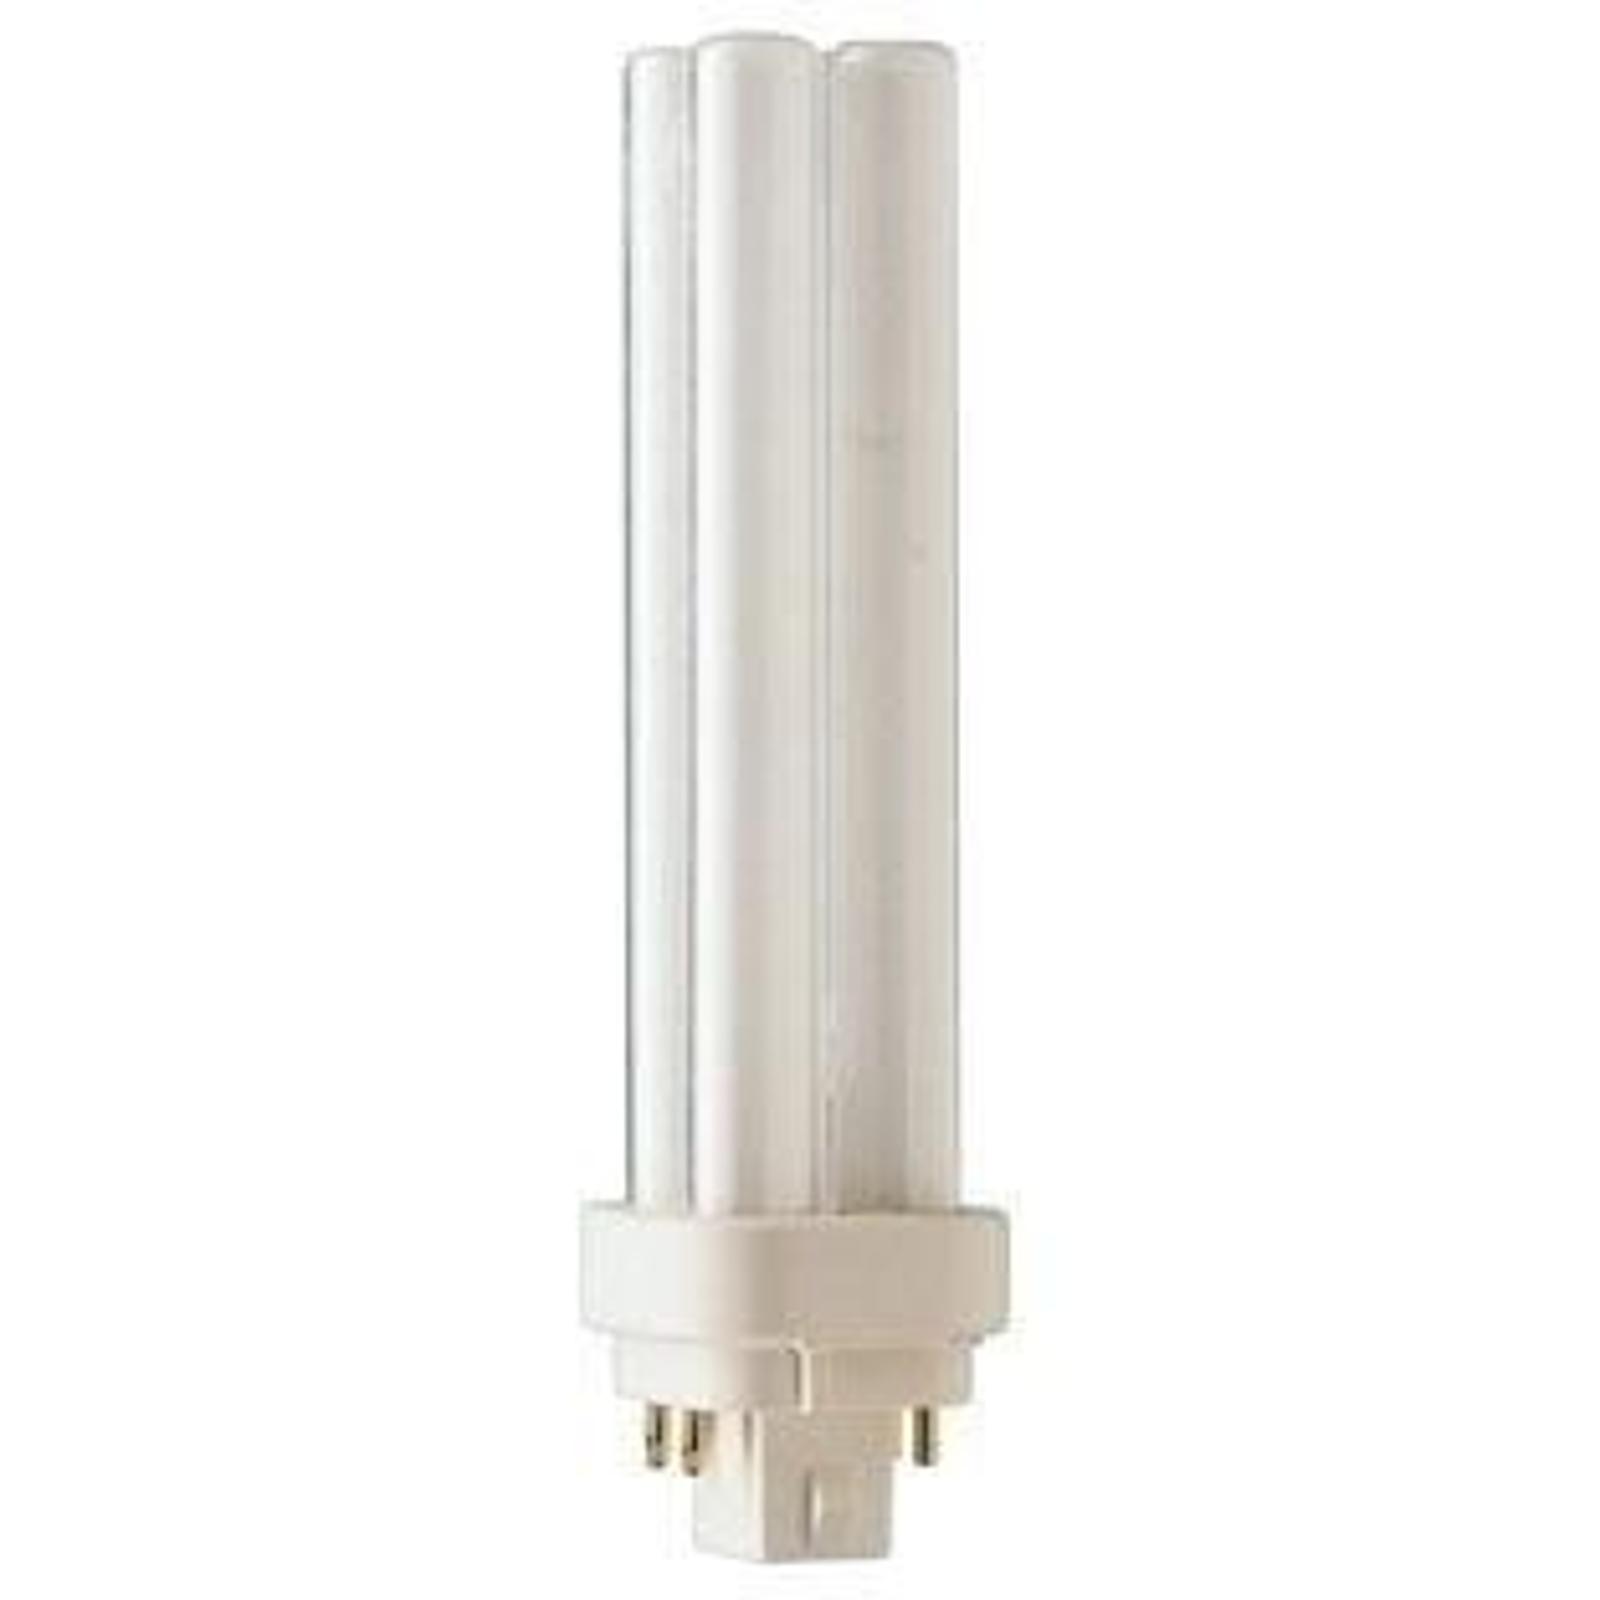 G24q 10W 827 Kompaktleuchtstofflampe DULUX D/E